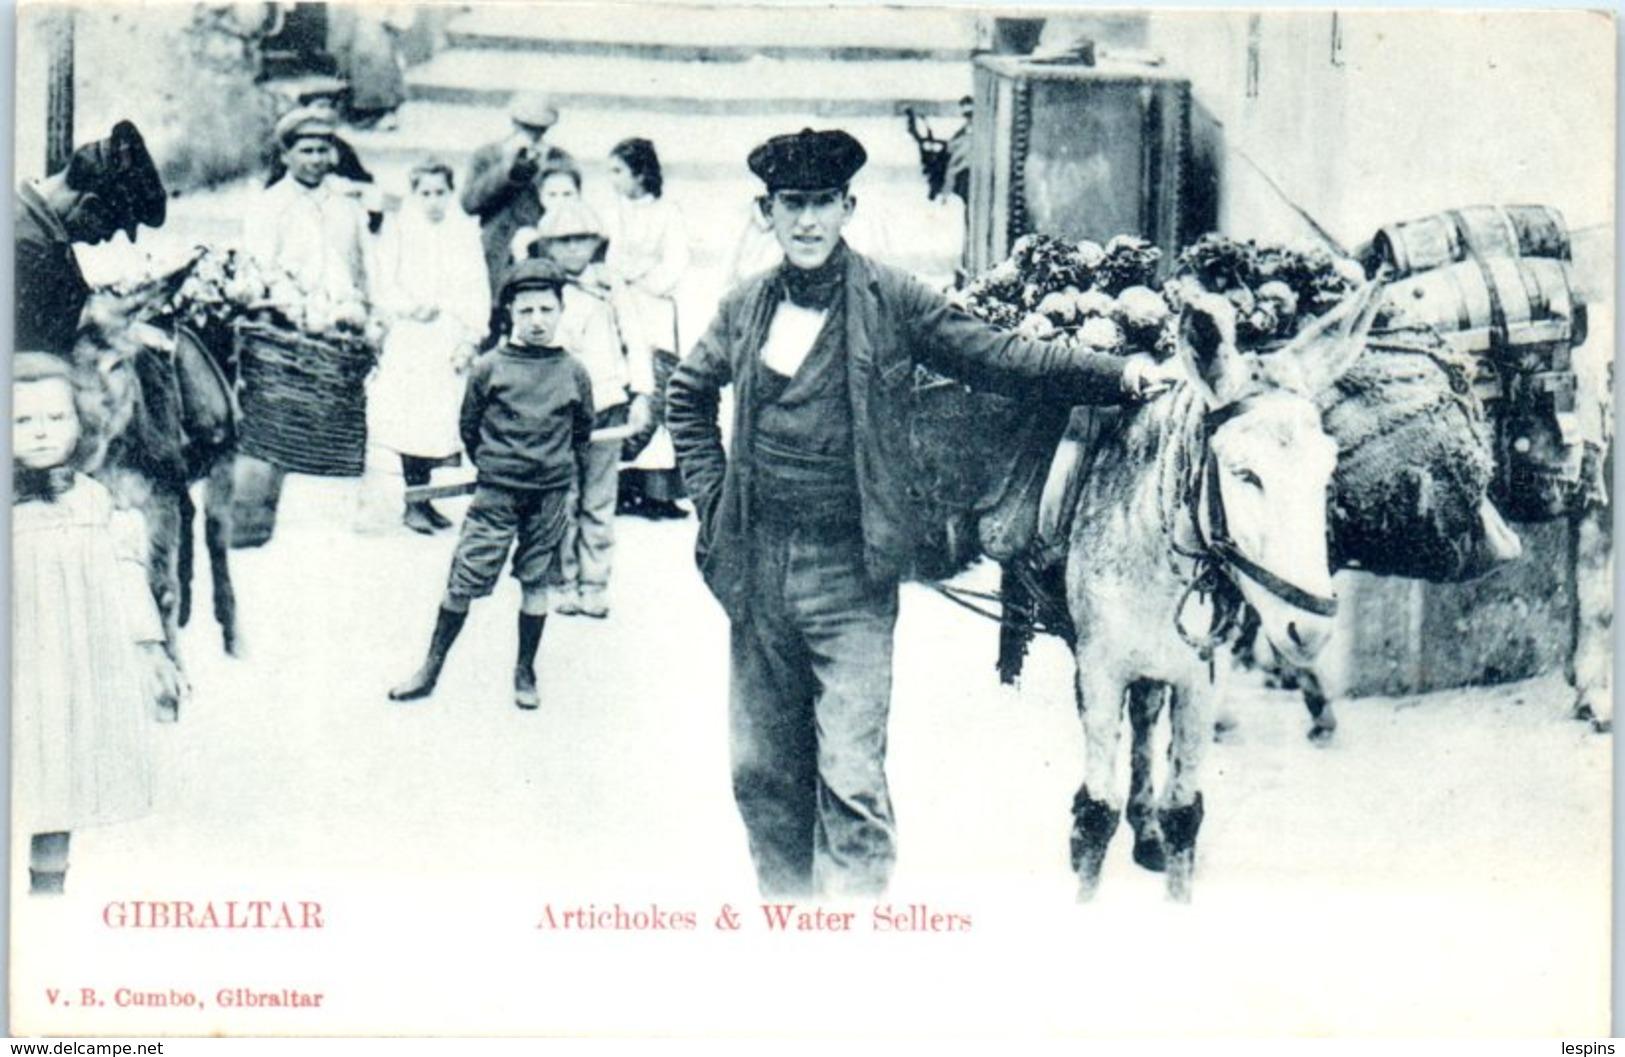 EUROPE -  GIBRALTAR - Artichokes & Water Sellers - Gibraltar